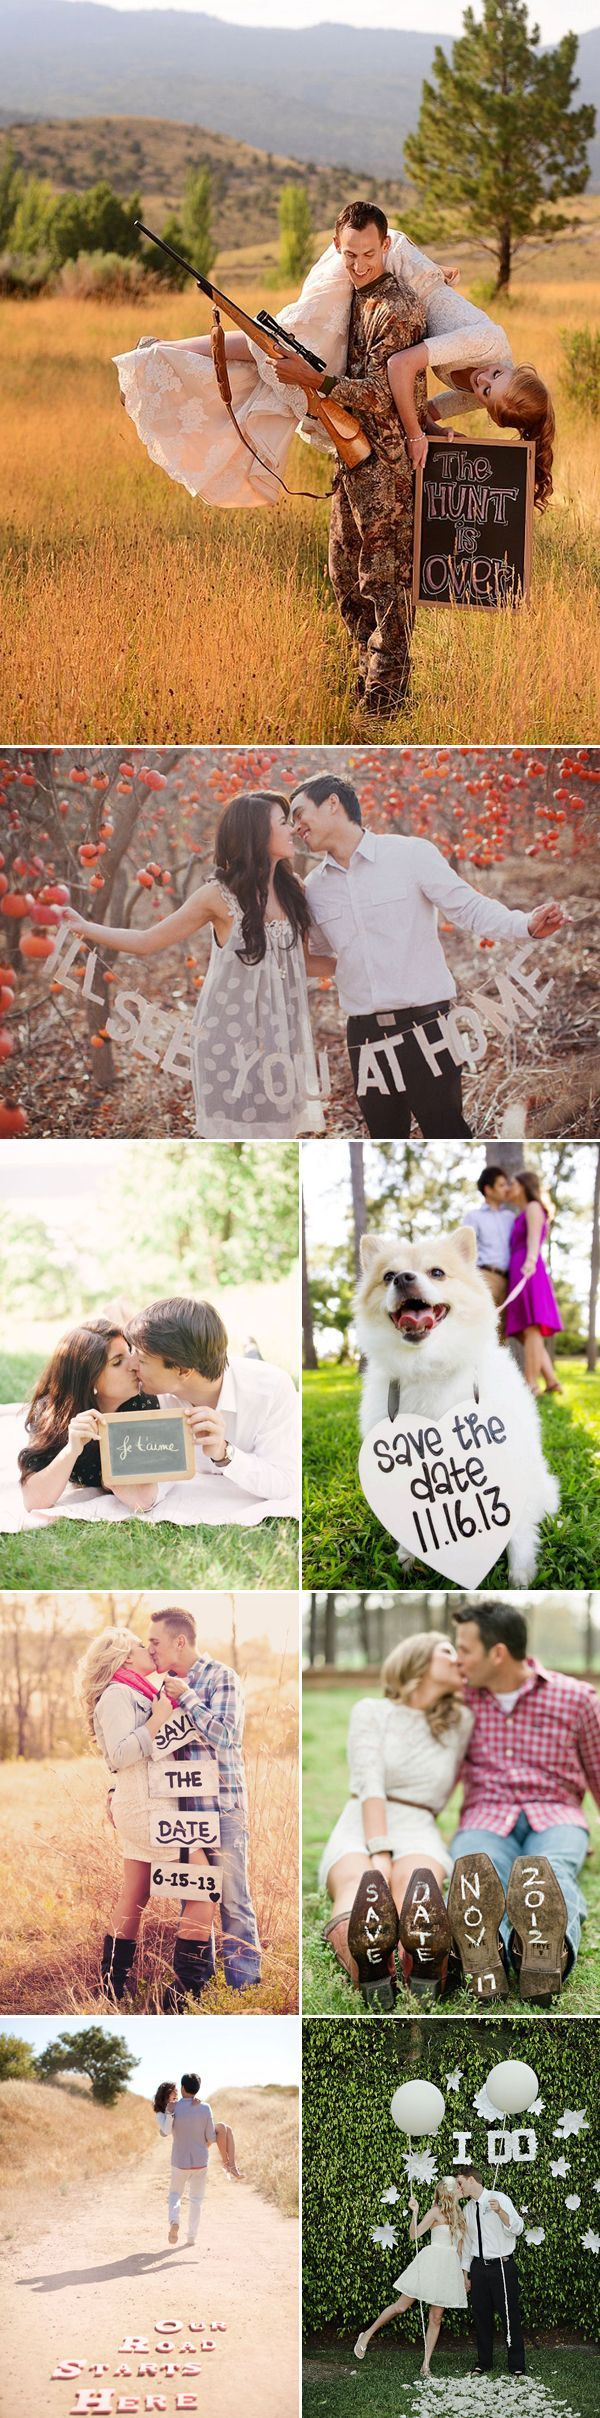 37 Fun Engagement photos  pinned by Michael Eric Berrios DJMC #weddingdj #destinationwedding #keywestdj